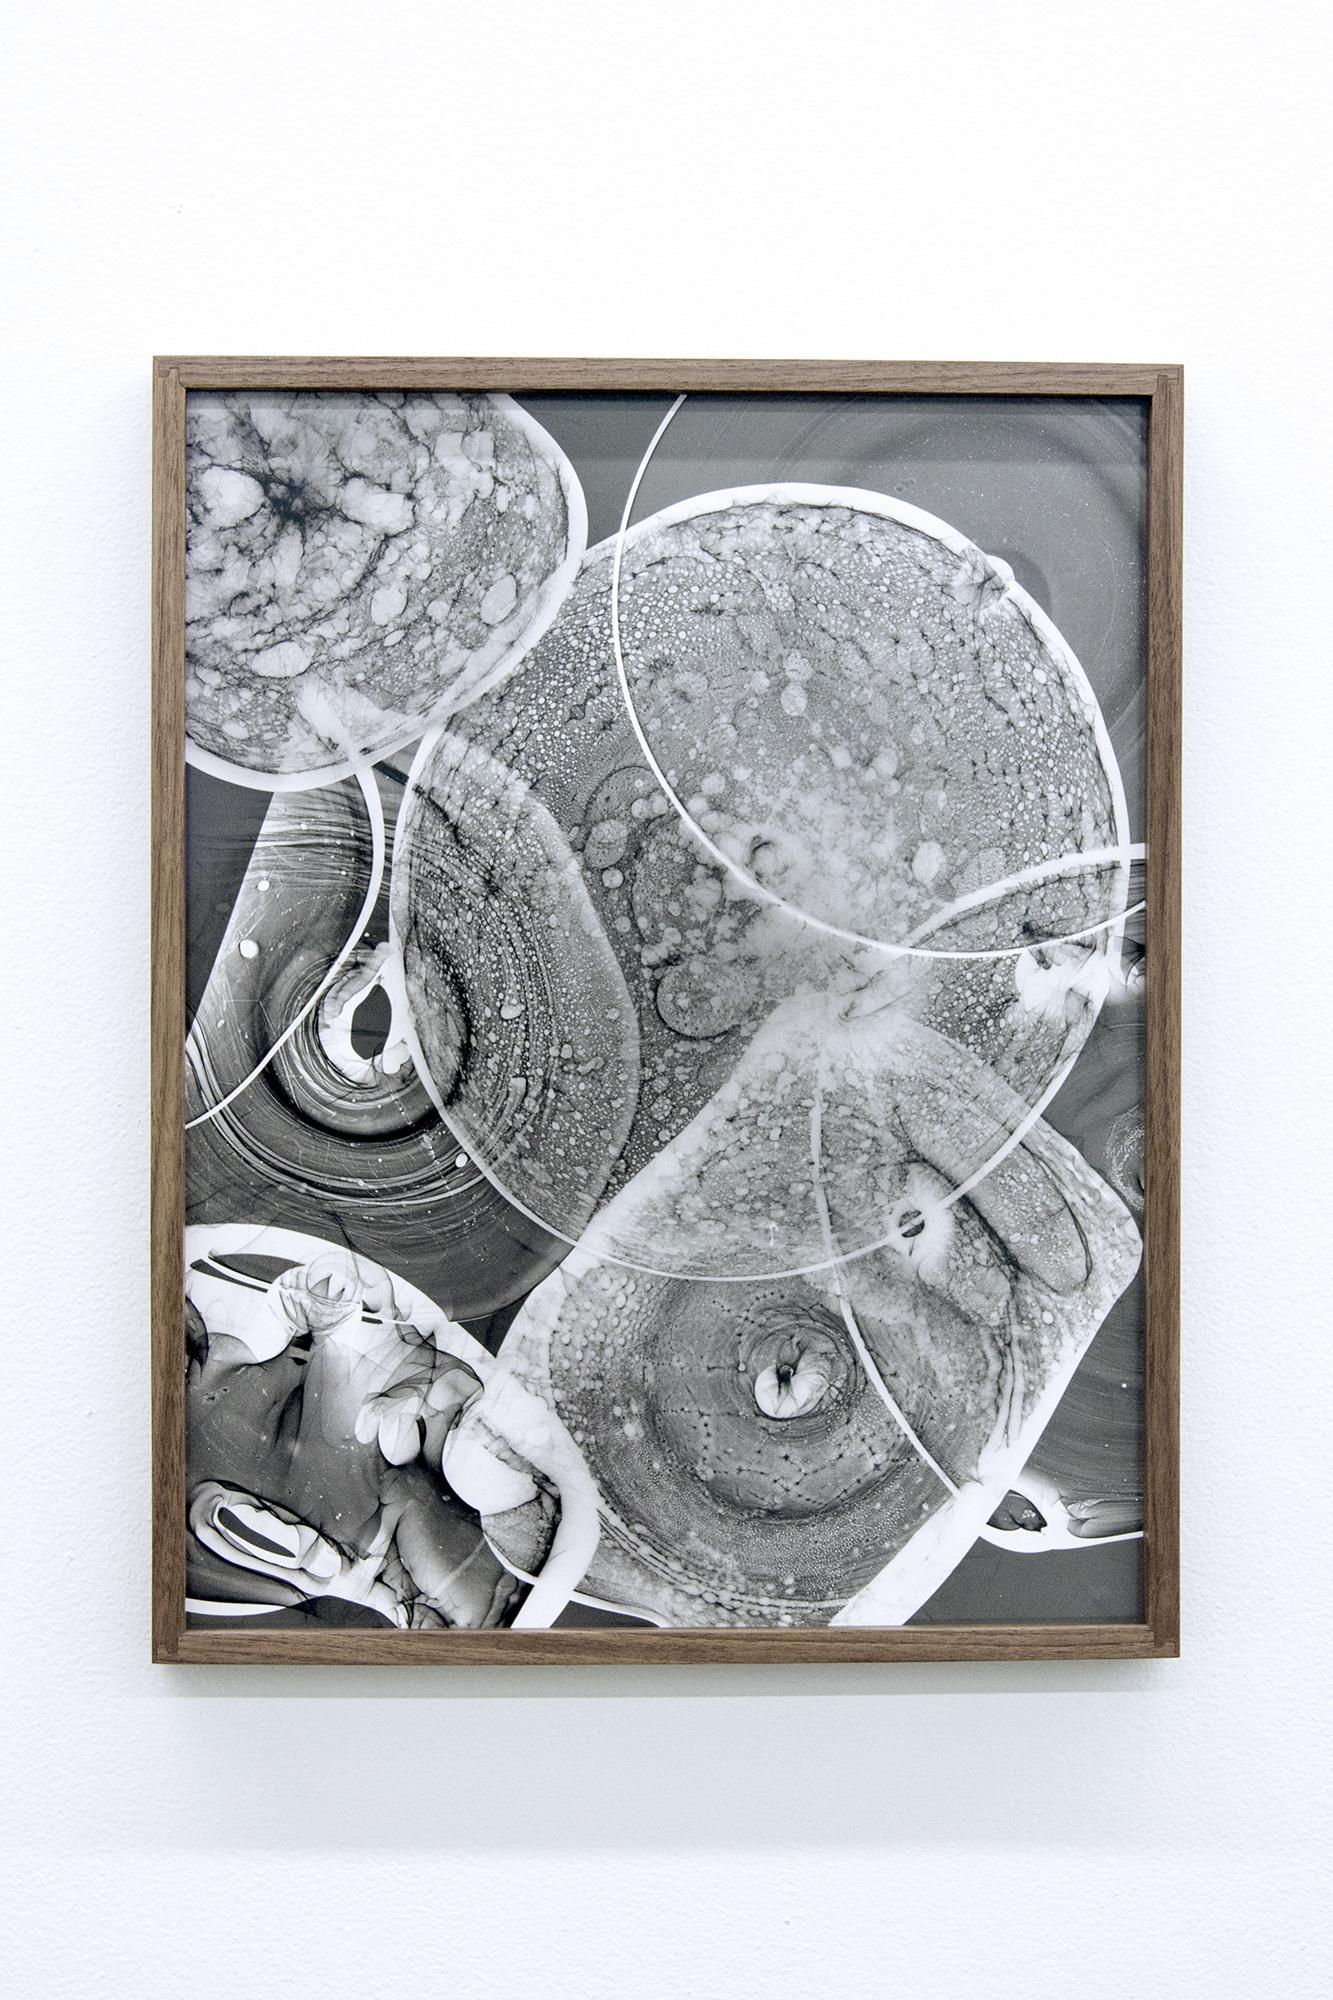 Kelly Akashi Lenses 2018 Silver gelatin photogram...